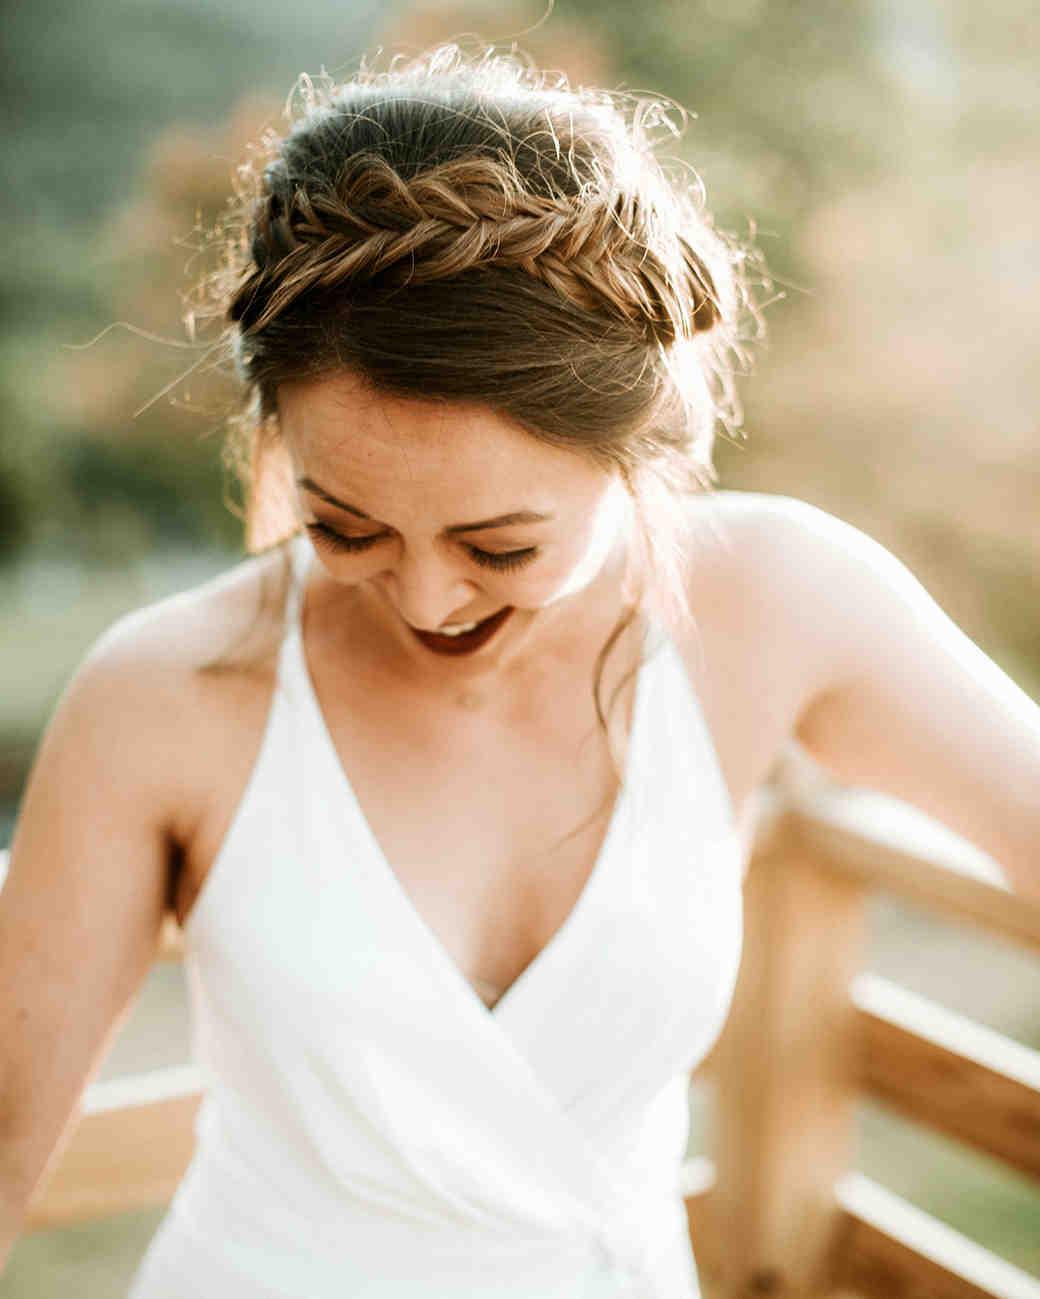 The Best Hairstyles For Every Wedding Dress Neckline Martha